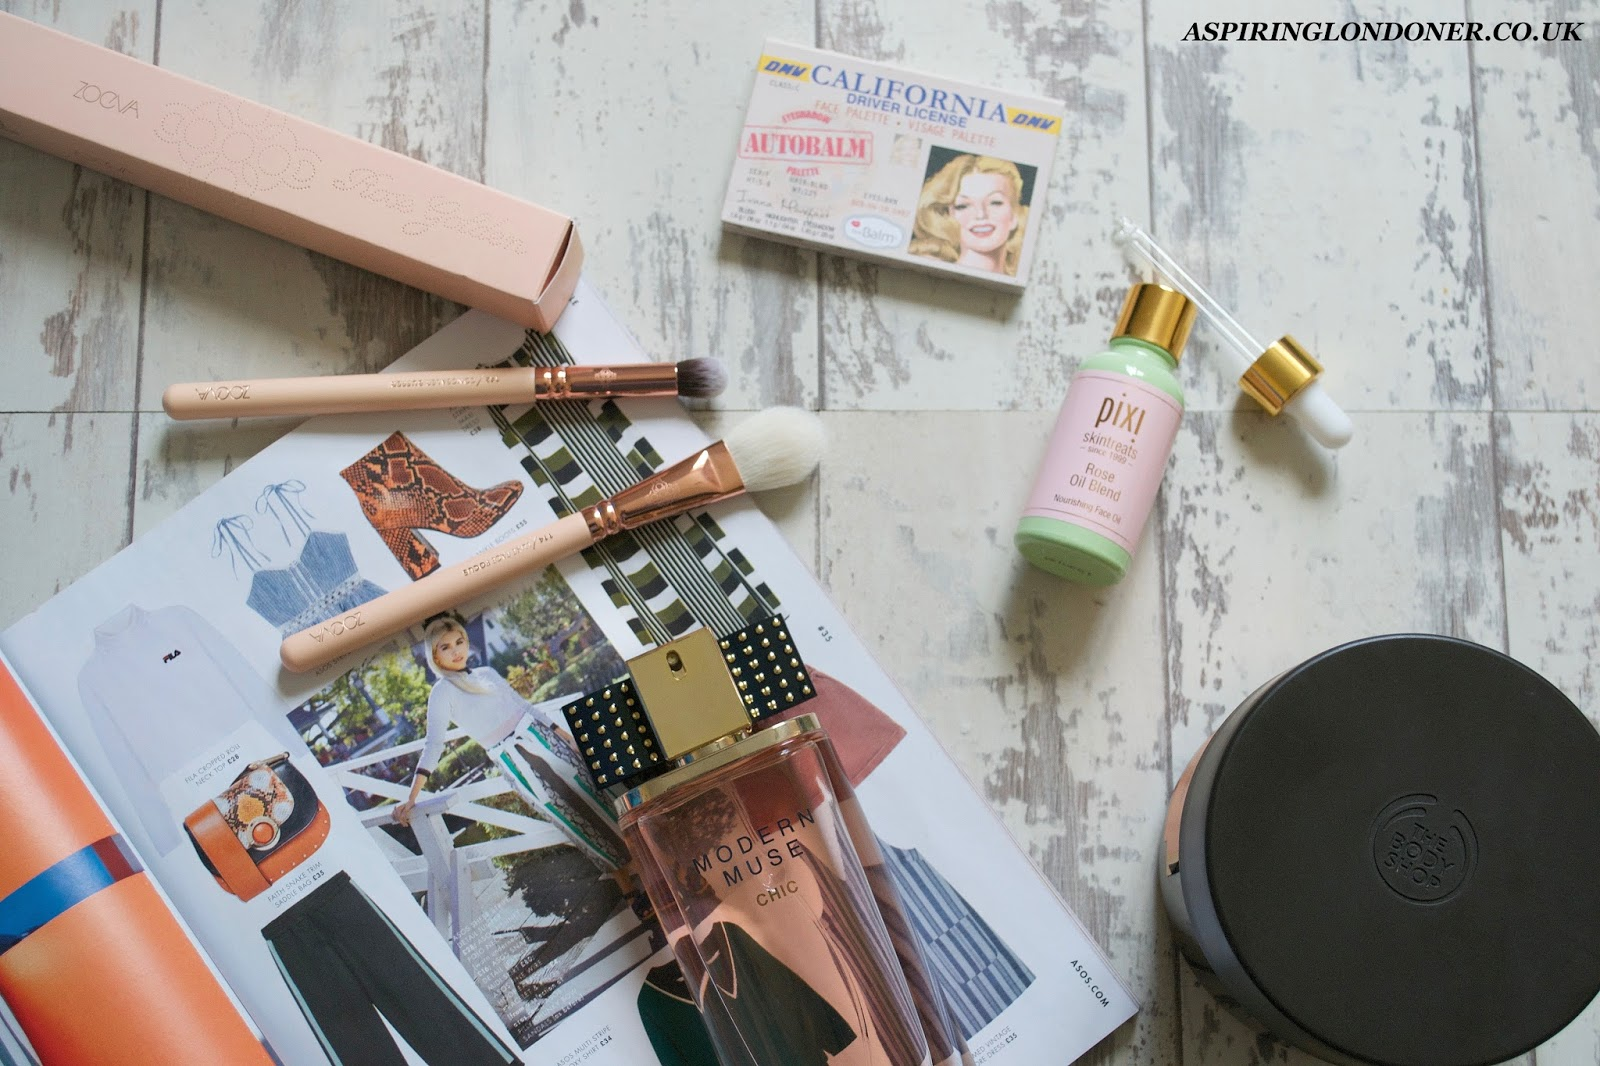 Mother's Day Gift Guide 2016 - Aspiring Londoner